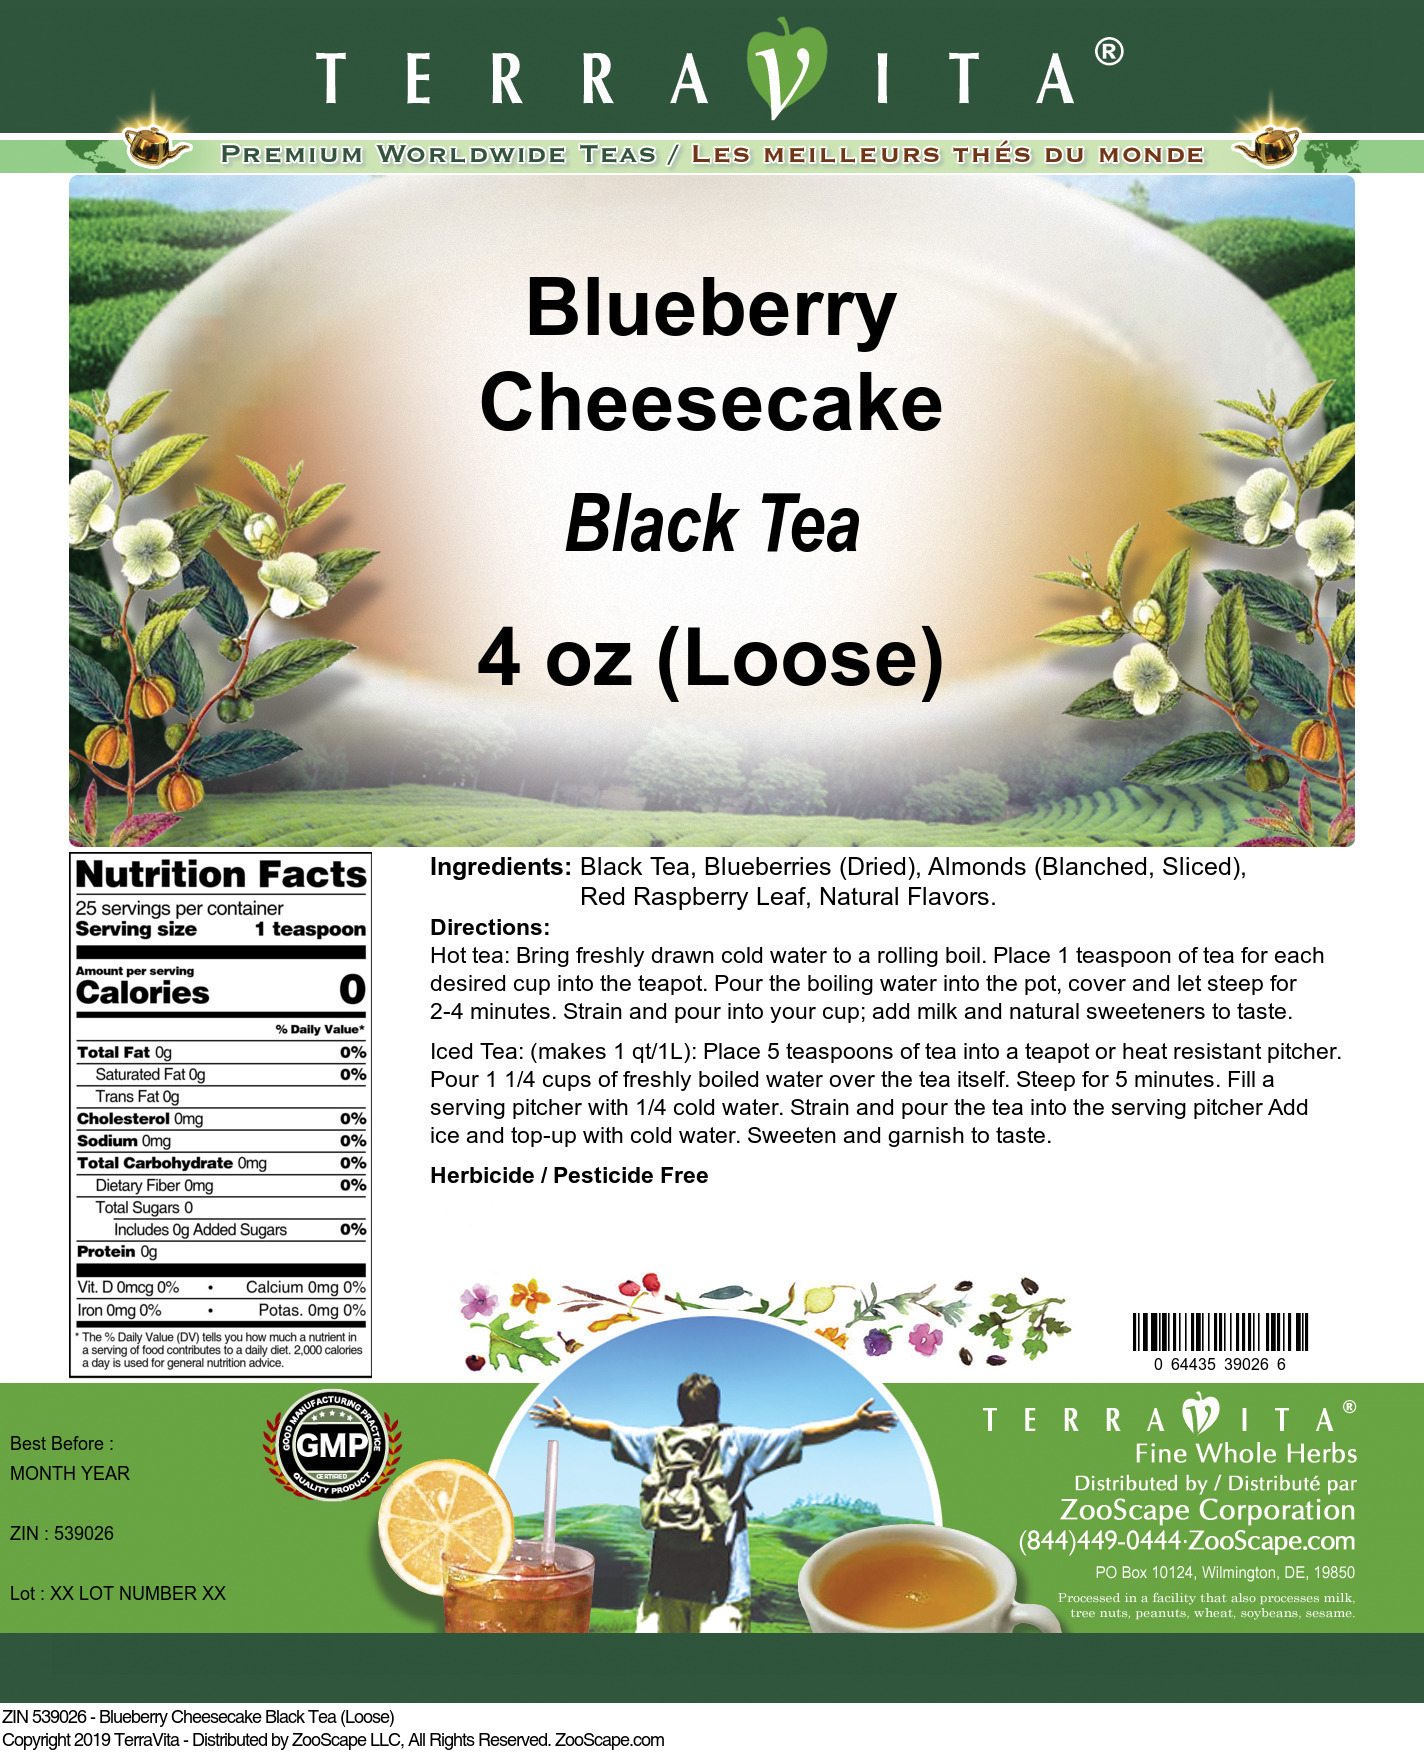 Blueberry Cheesecake Black Tea